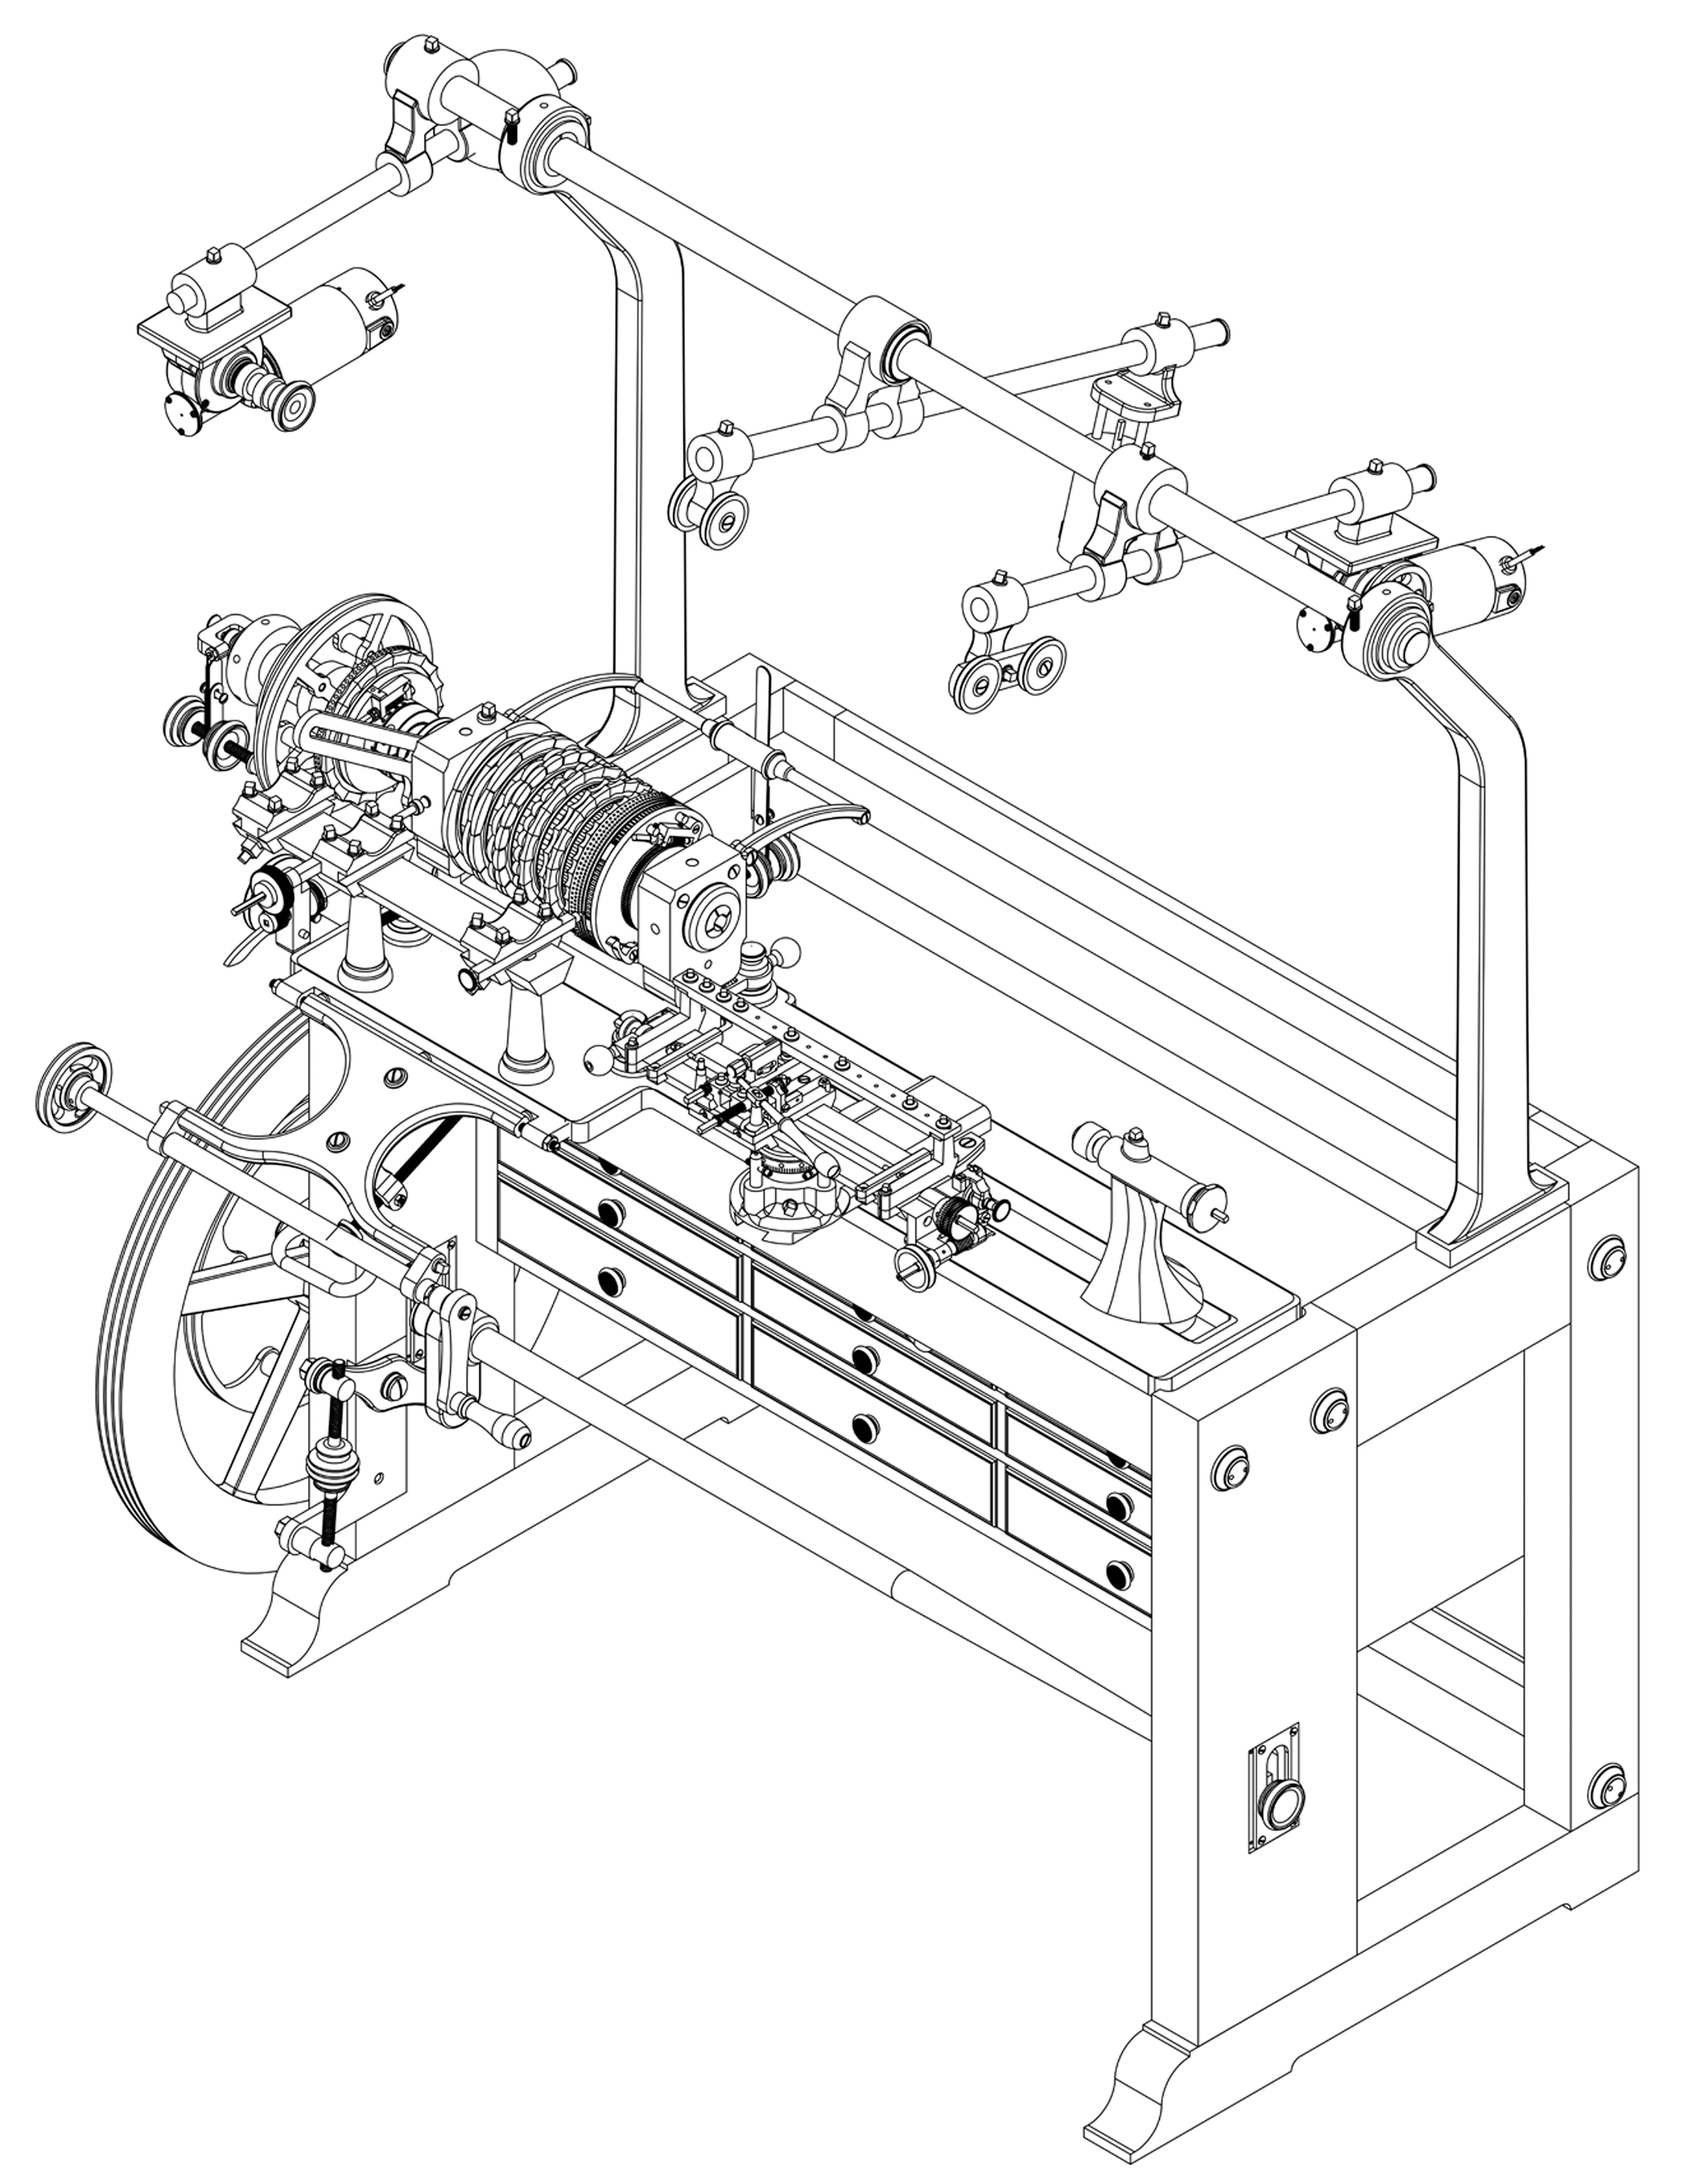 5320x6850 Lathest News Made Ornamental Rose Engine A Modern Composition